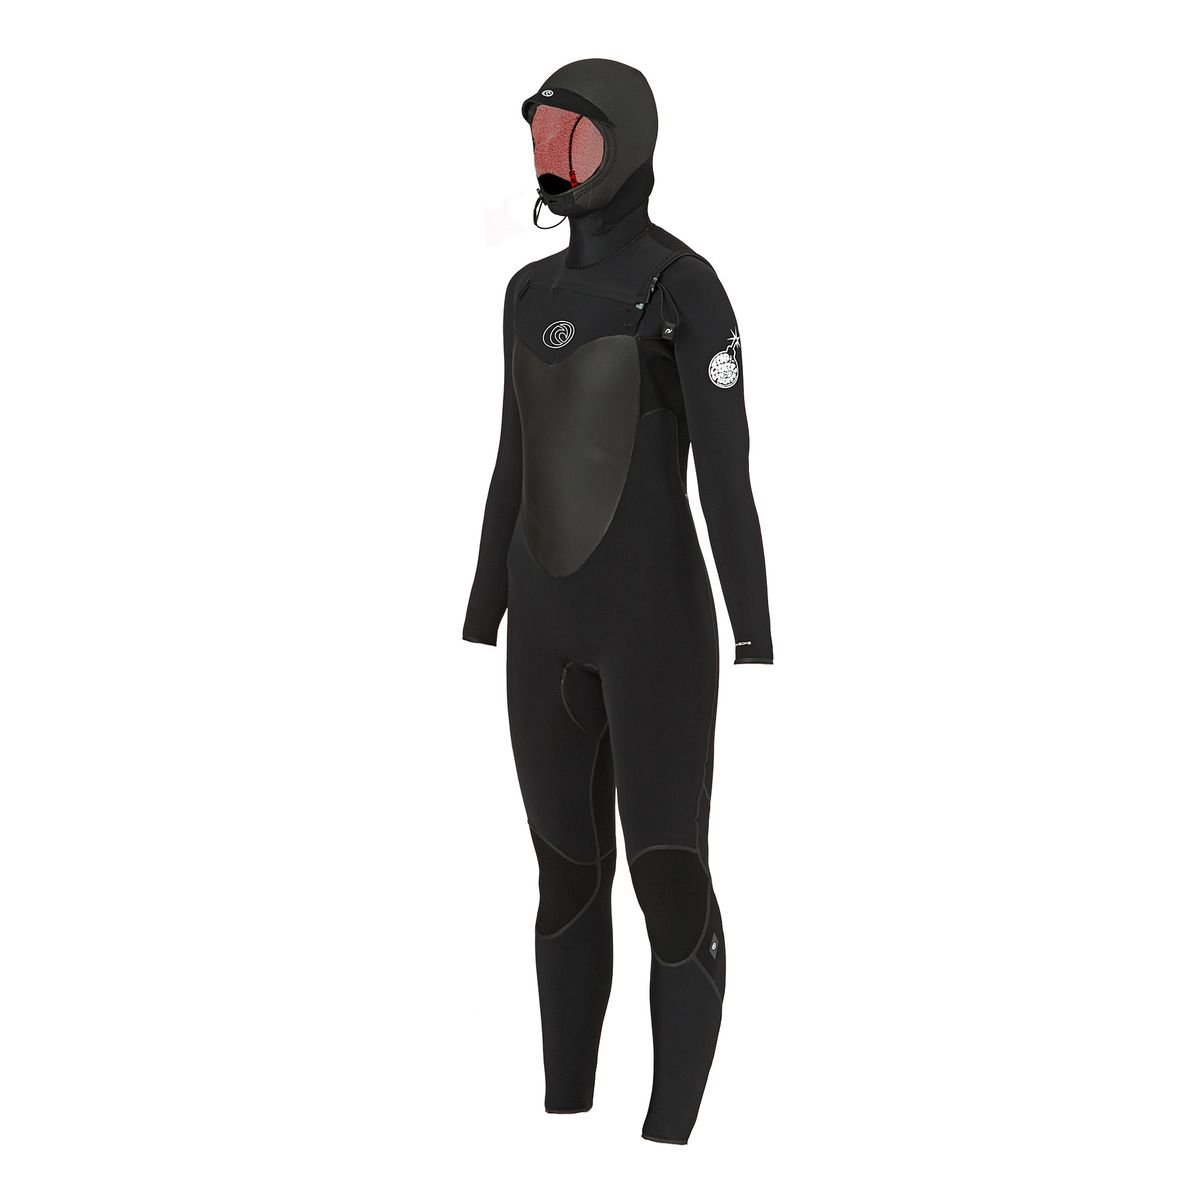 Wetsuit long Women Rip Curl Flashbomb Hood 5 4 Chest Zip Wetsuit   Amazon.co.uk  Clothing fc88d2b4a